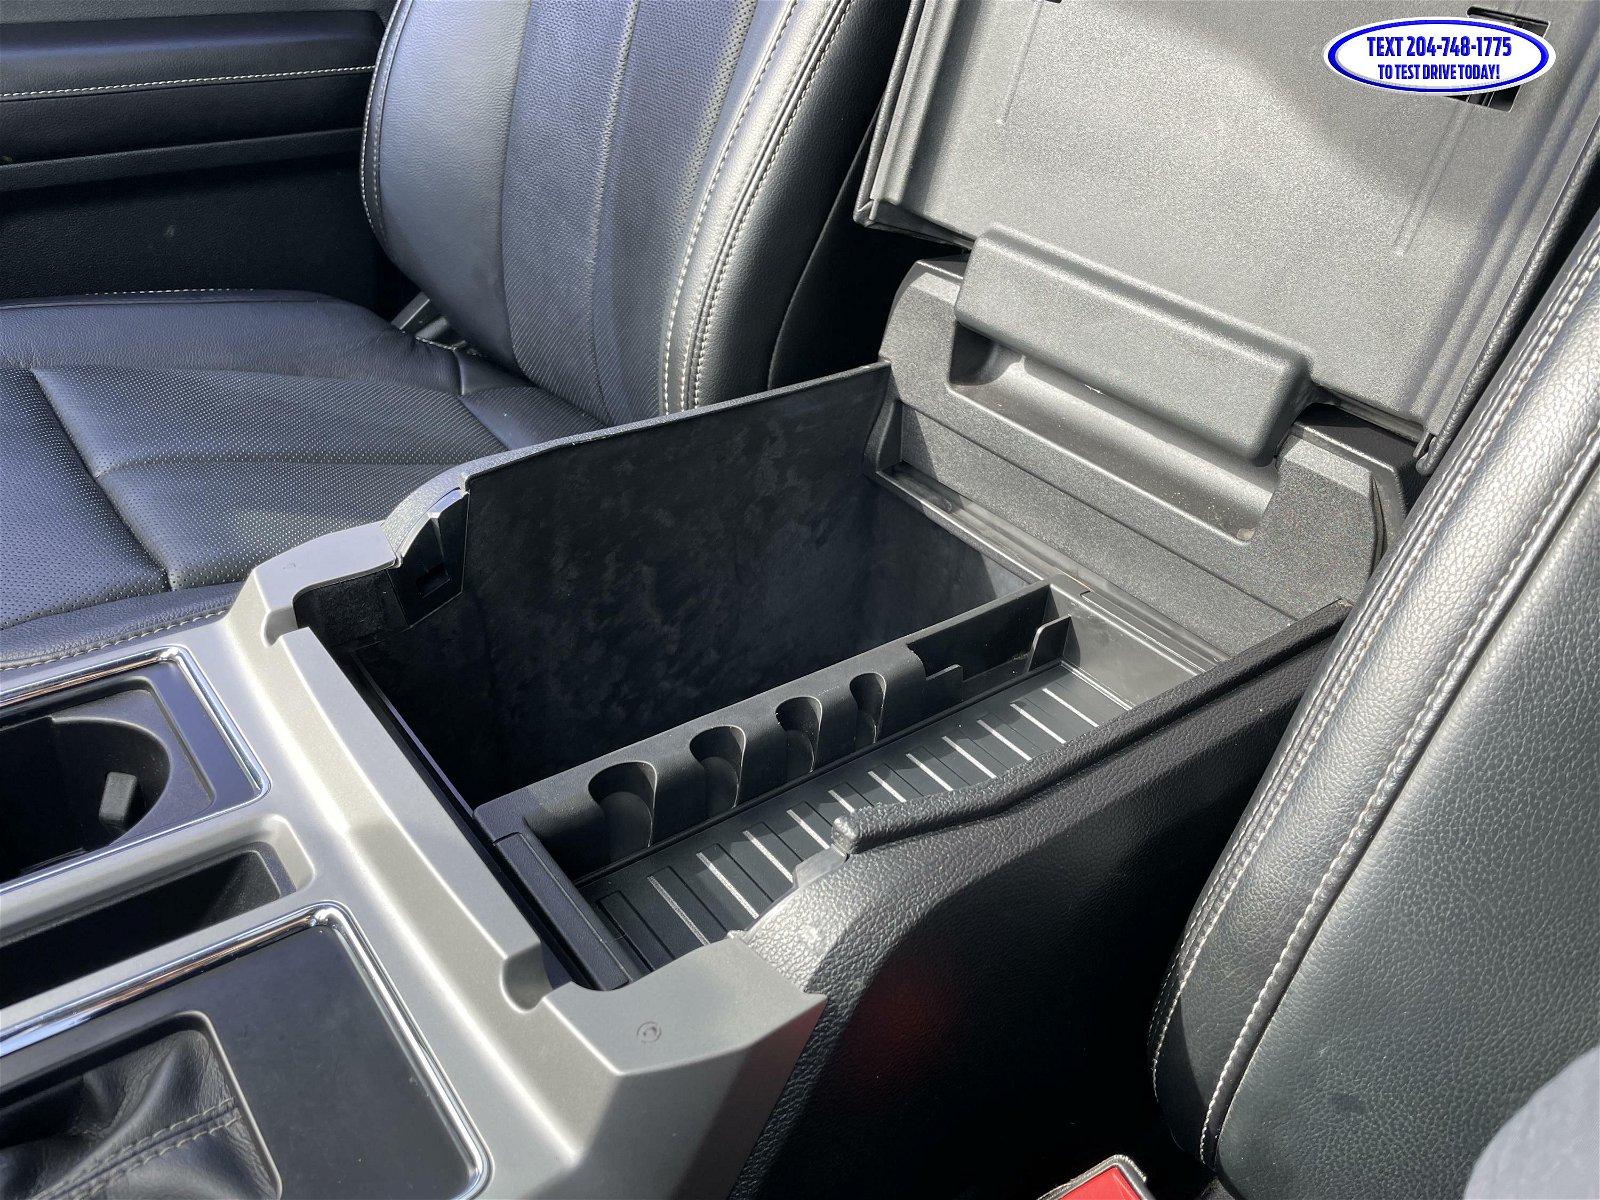 2018 Ford F-150 LARIAT Sport 502A Diesel